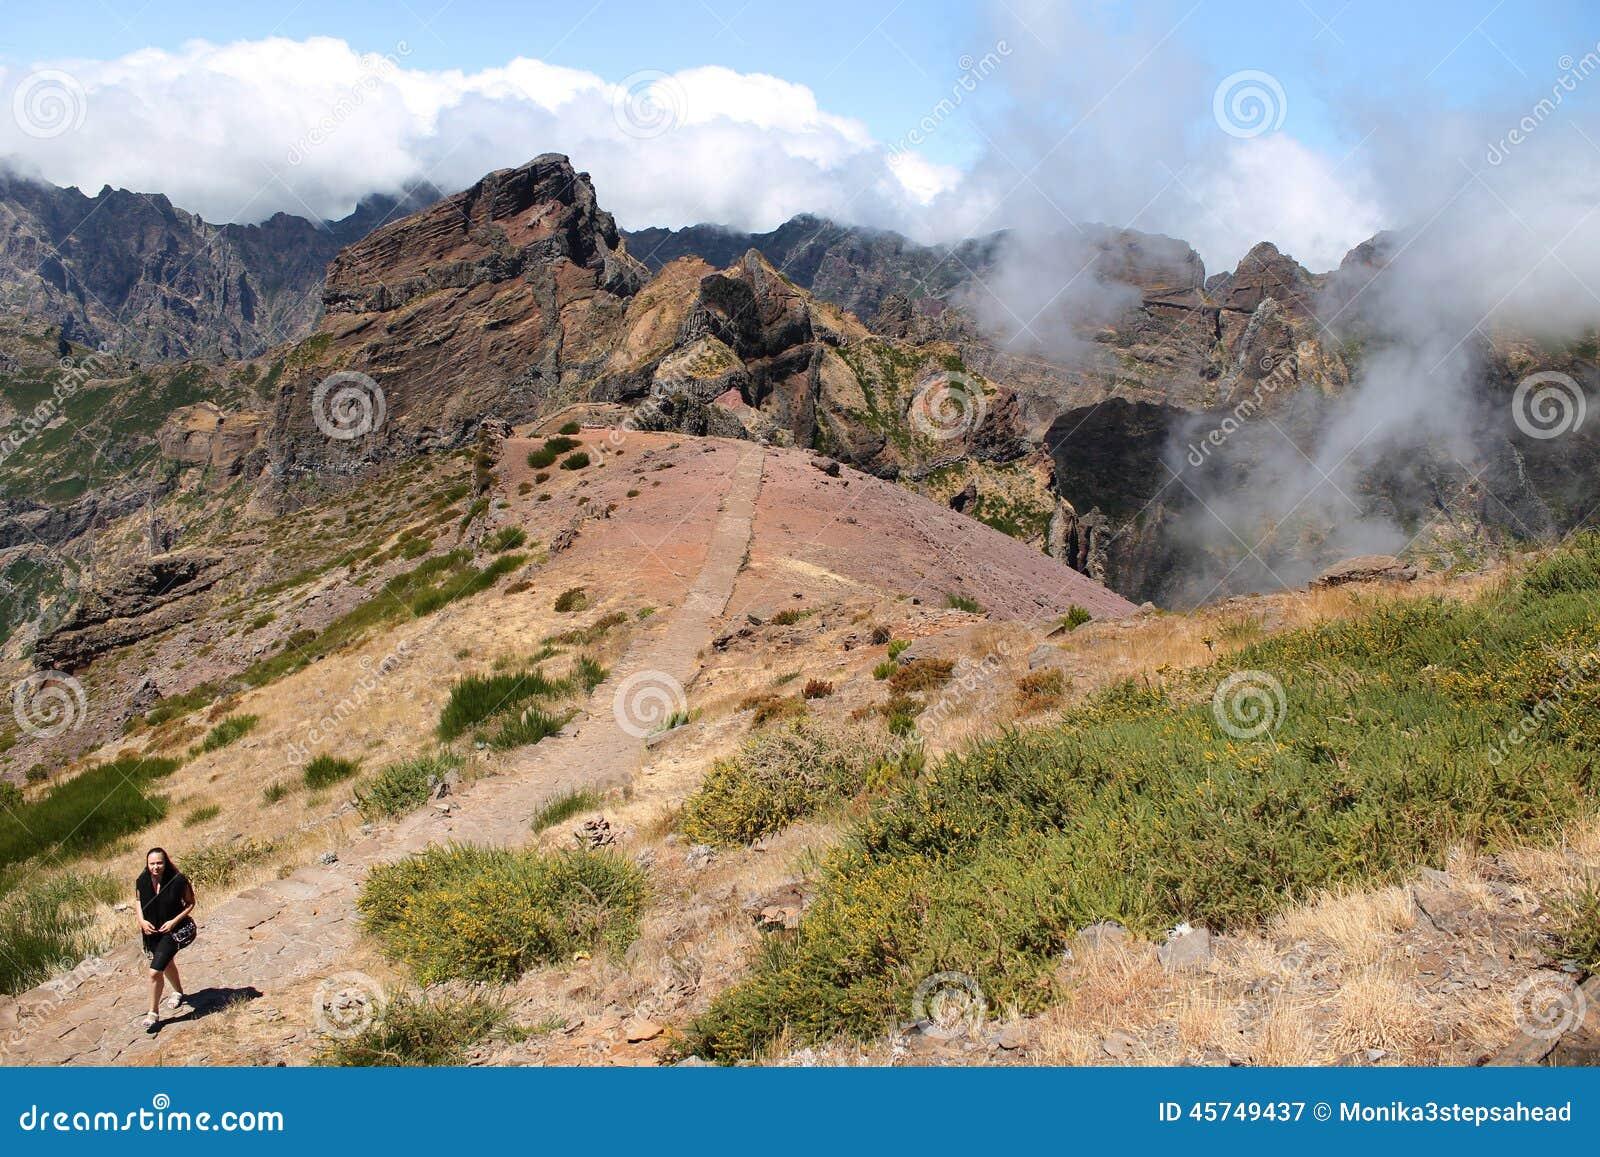 Woman walking alone in mountains